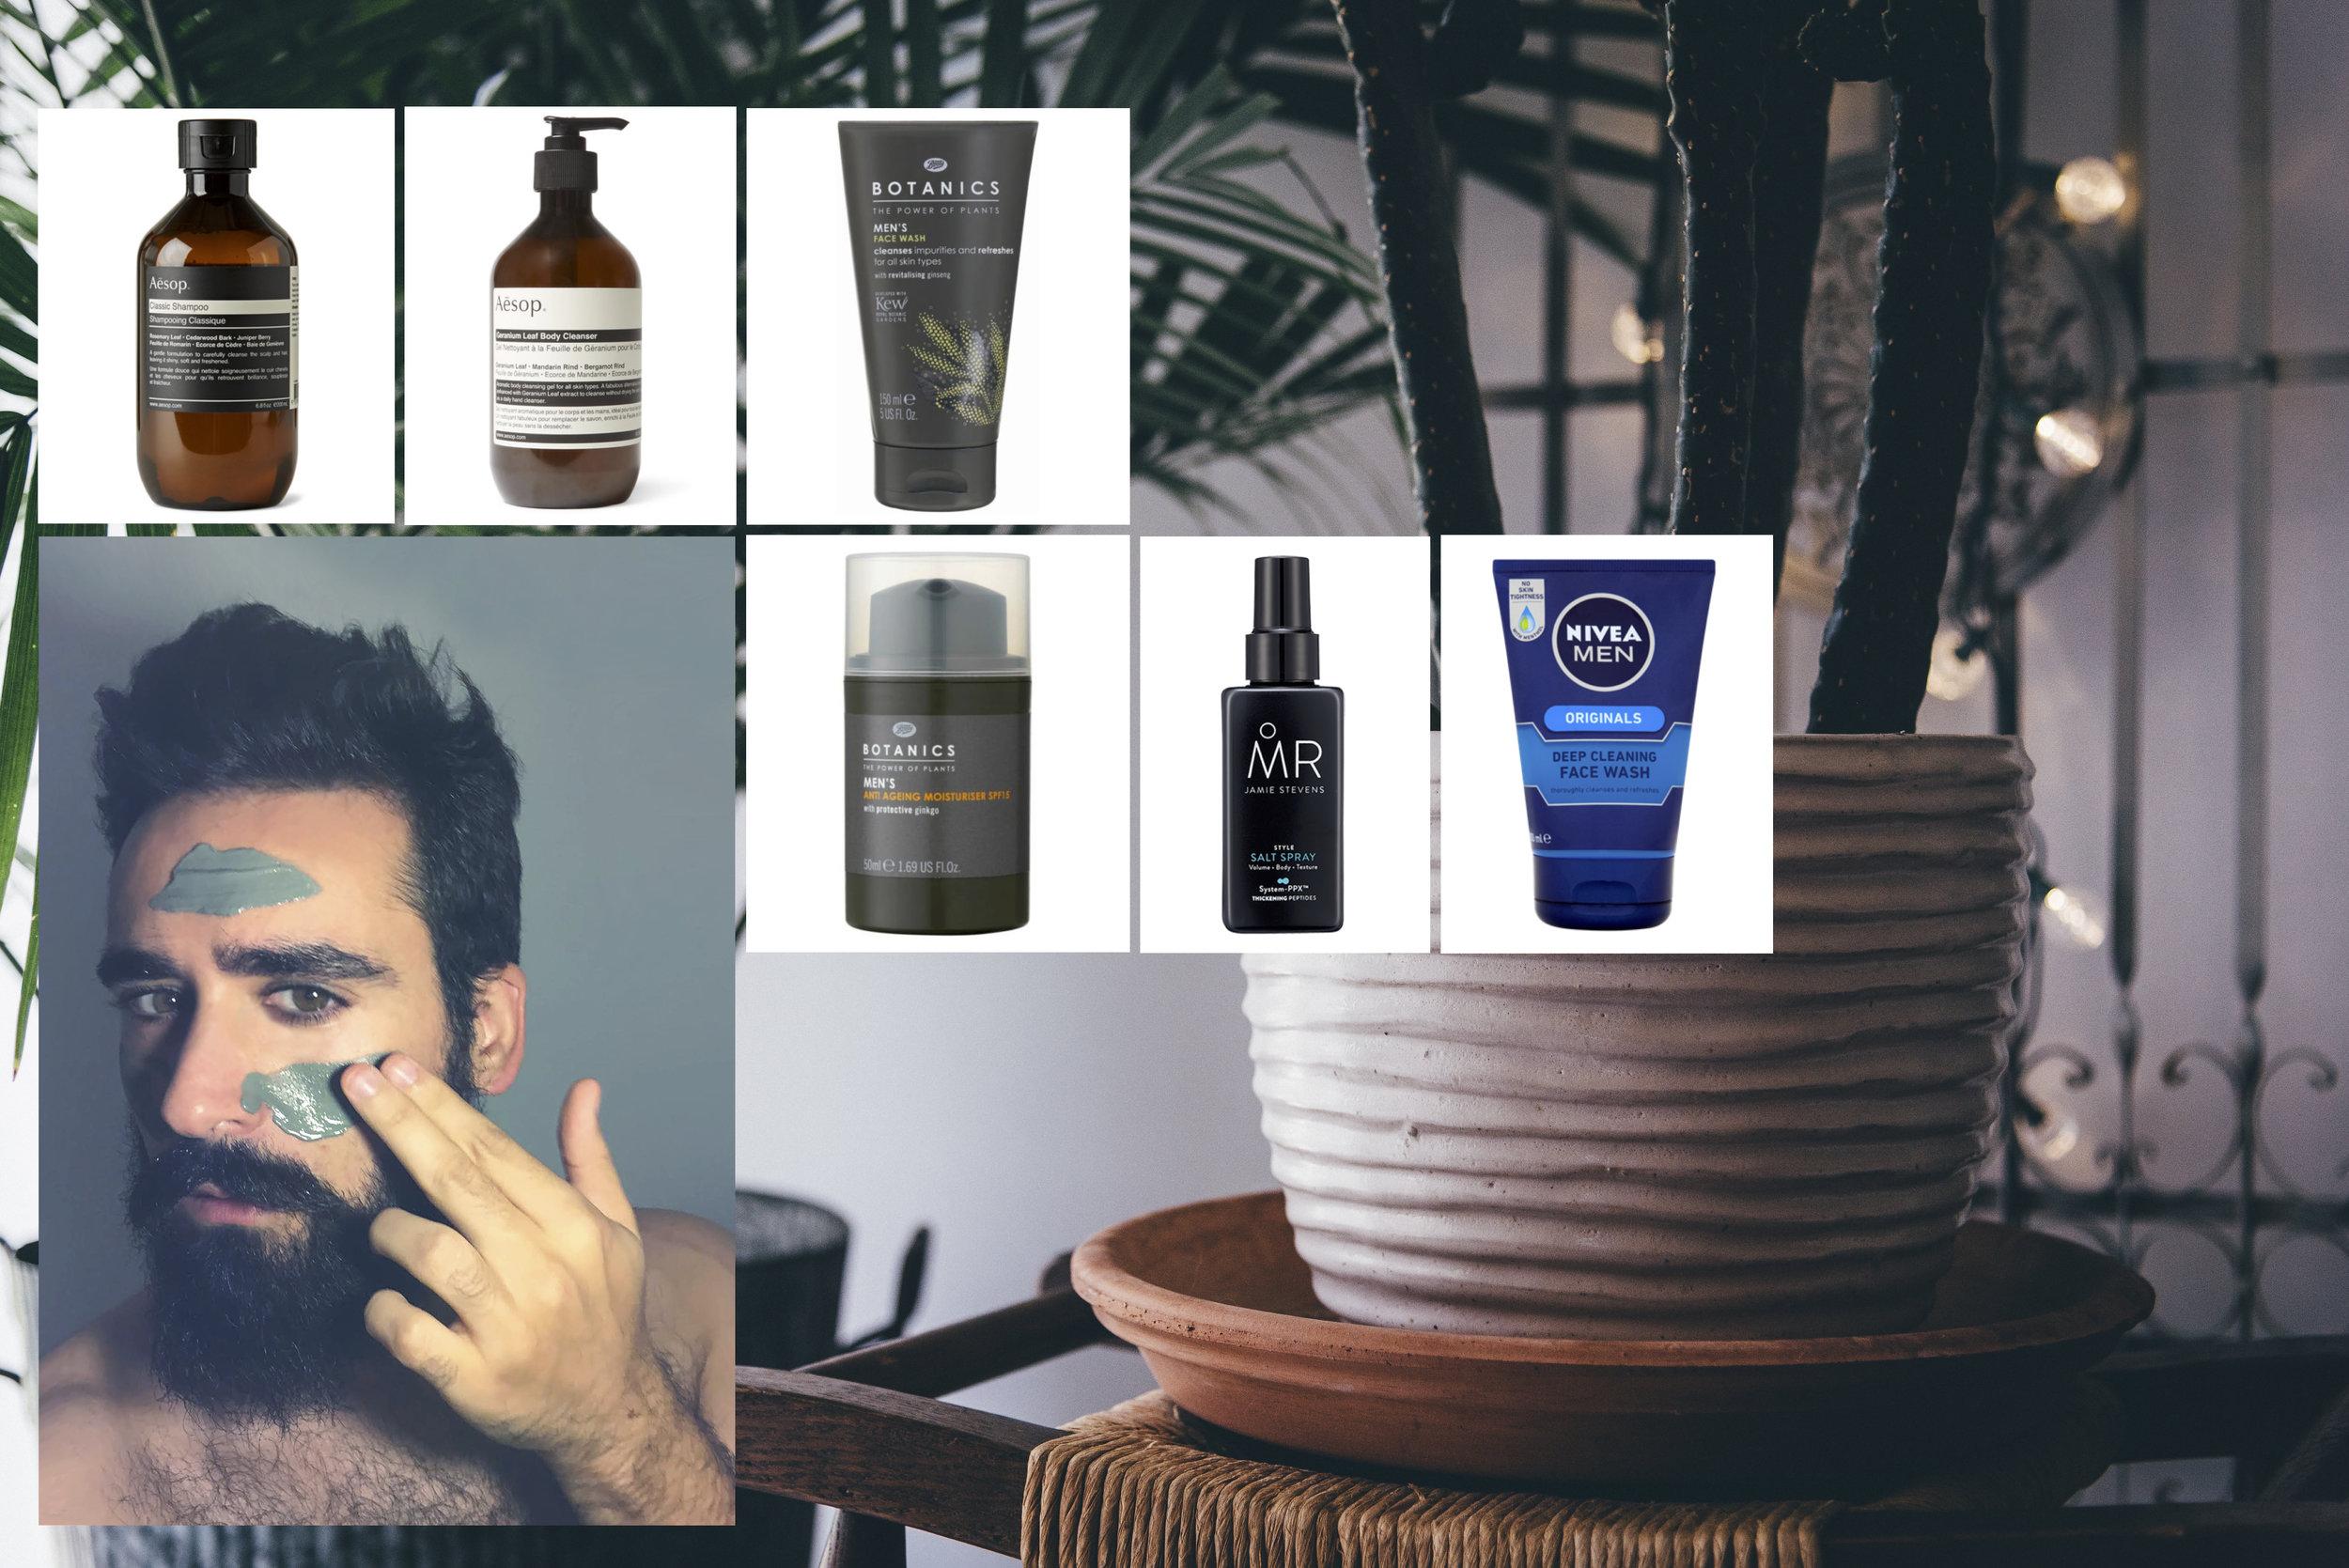 Aesop  Classic shampoo , 200ml £17 Aesop  Geranium leaf body cleanser , 200ml £17 Boots Botanics  Face wash , 150ml £3.99 Boots Botanics  Anti ageing moisturiser SPF 15, 50ml , £6.99 Jamie Steven's  MR. Style salt spray, 150ml , £10 Nivea for Men  Deep cleaning Face wash ,